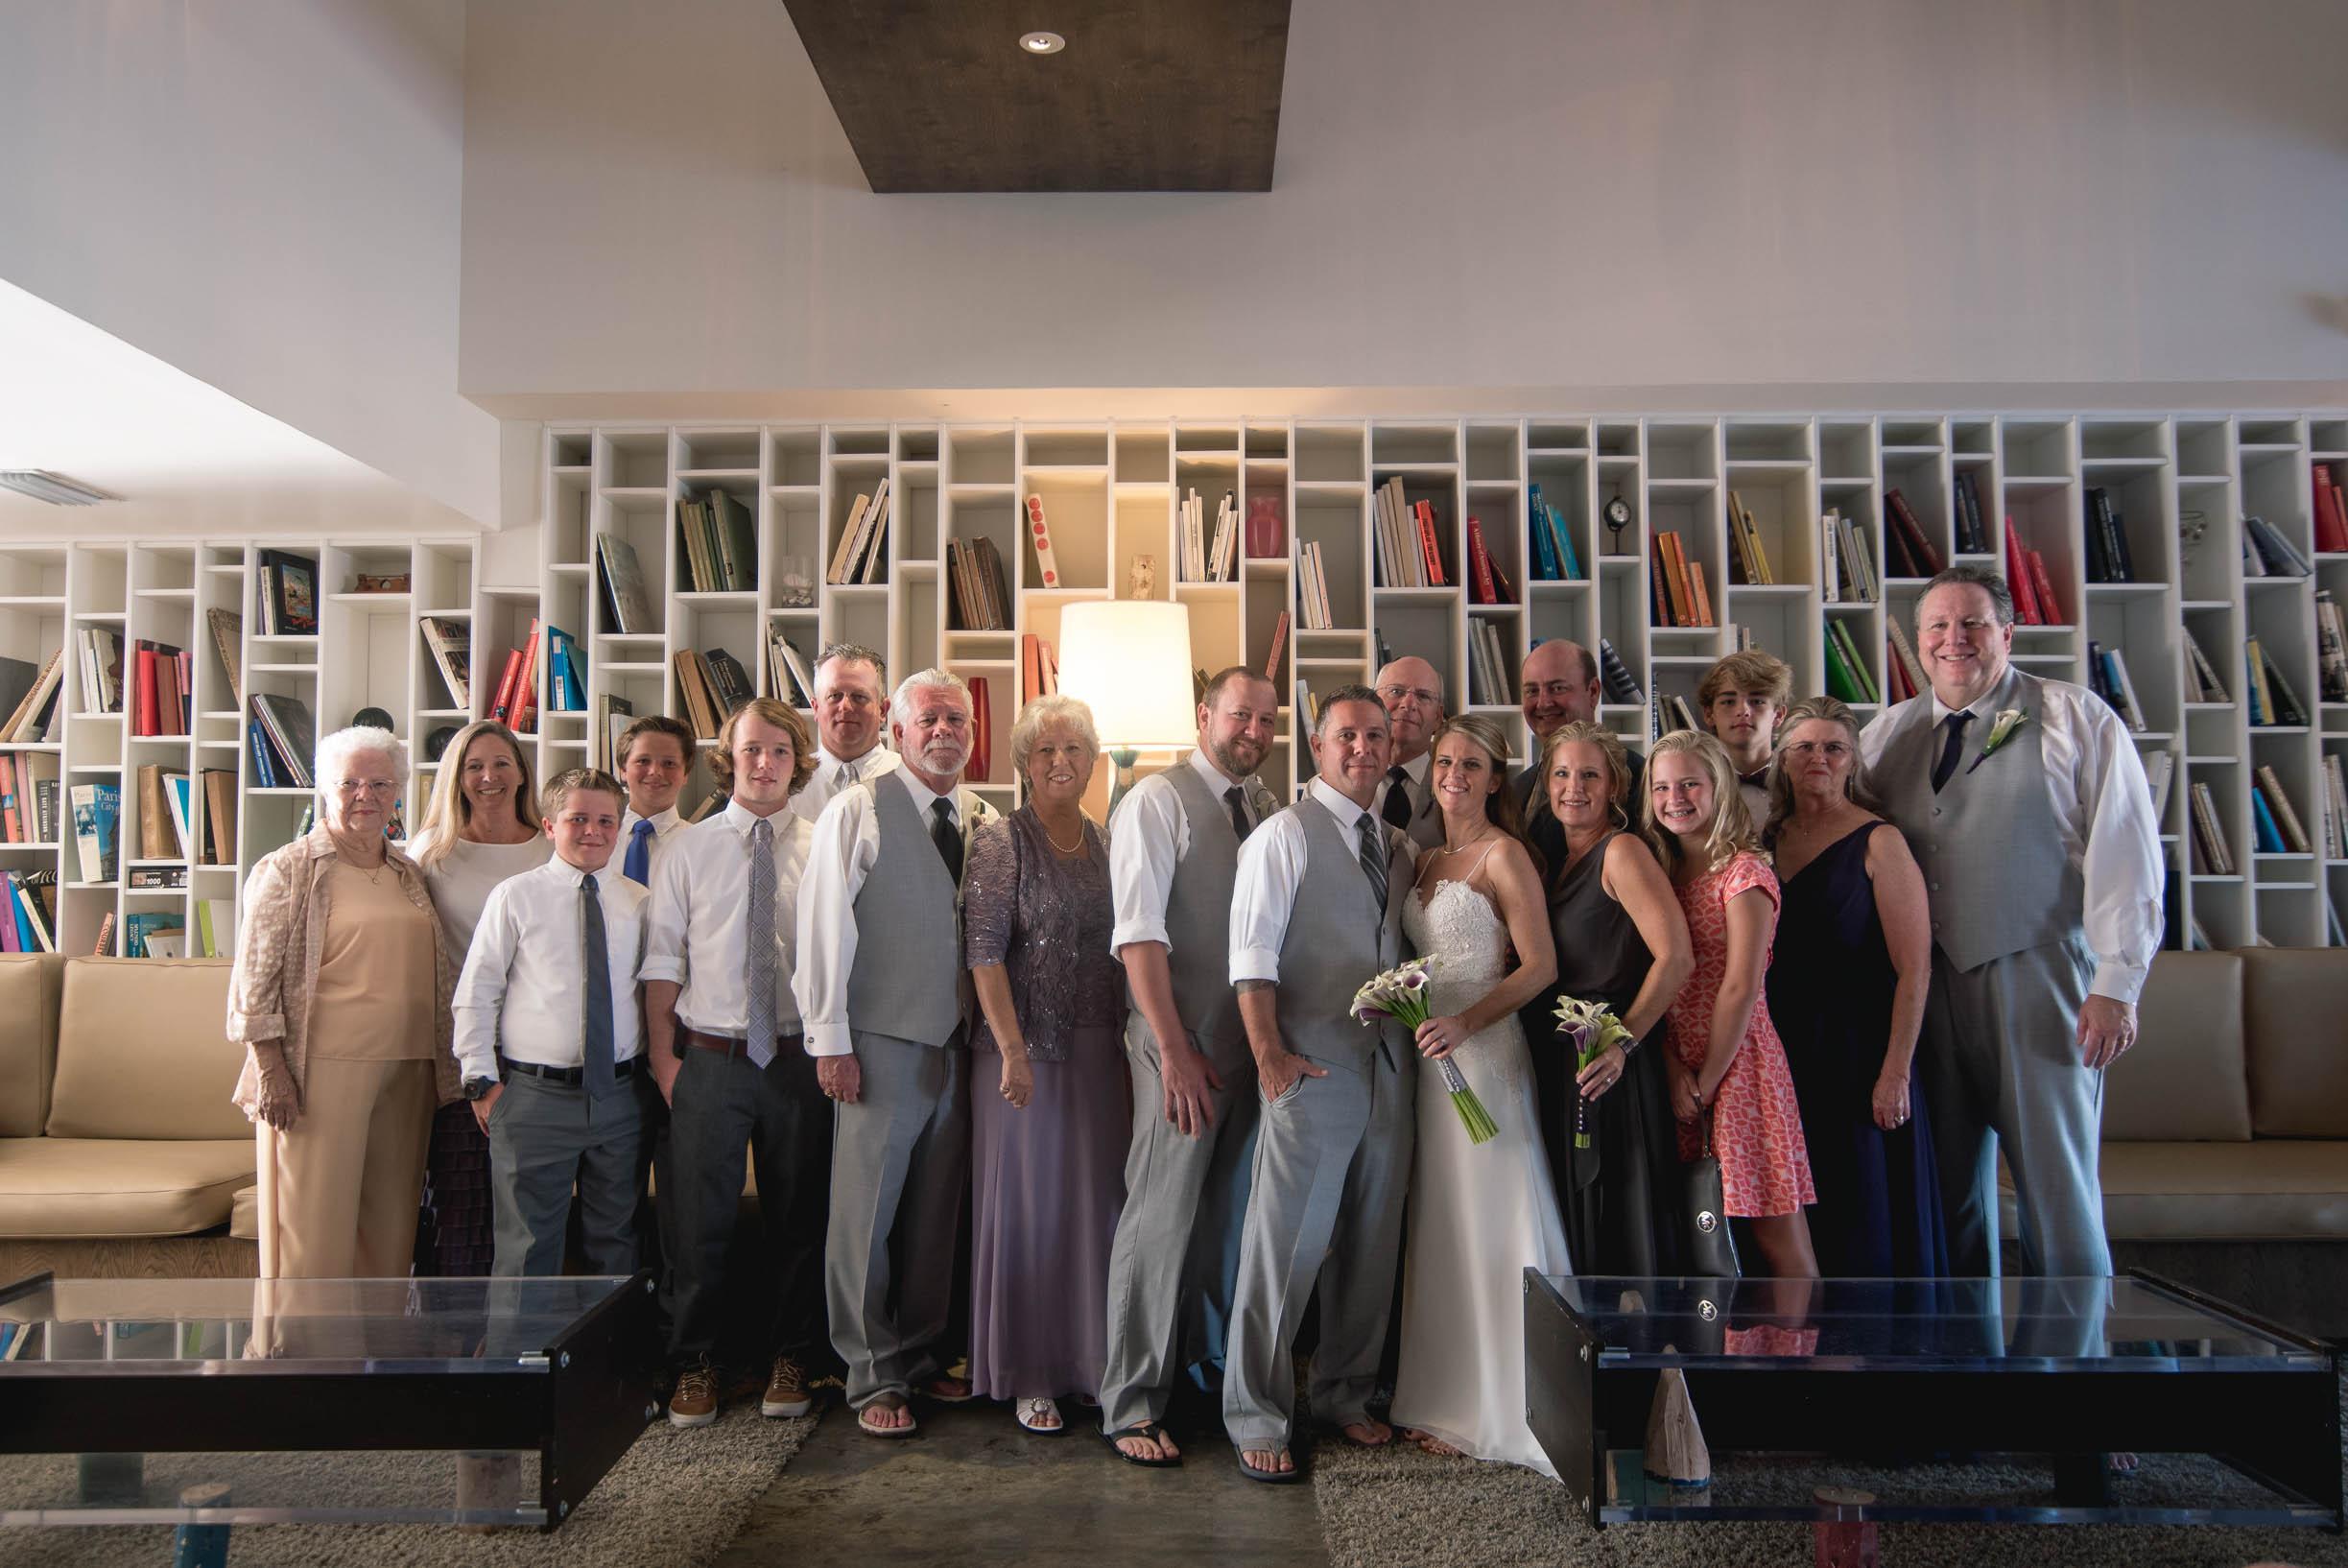 029Portland Wedding Photographer timothy capp.jpg